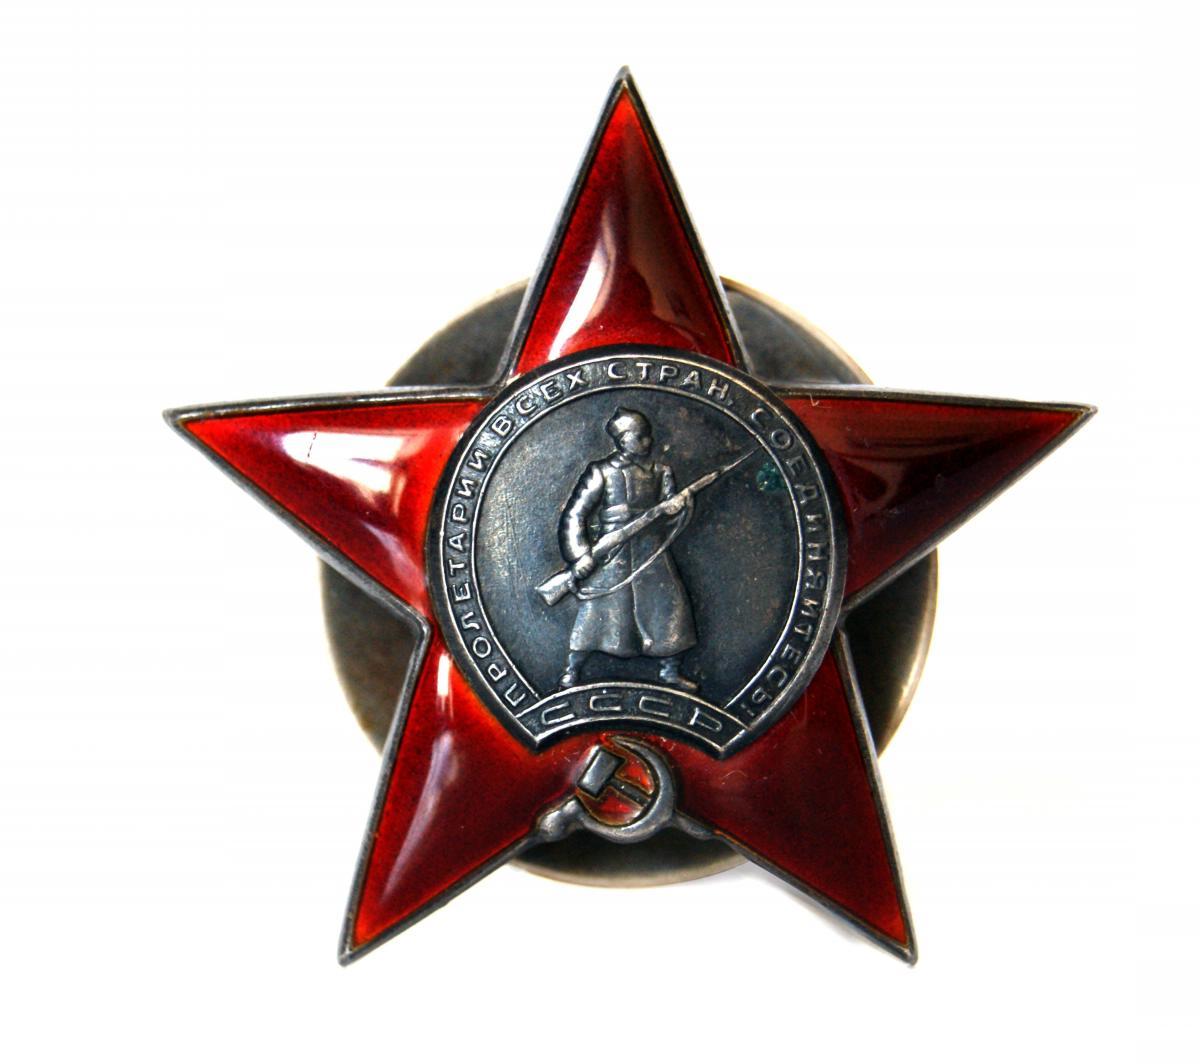 1орден Красной звезды